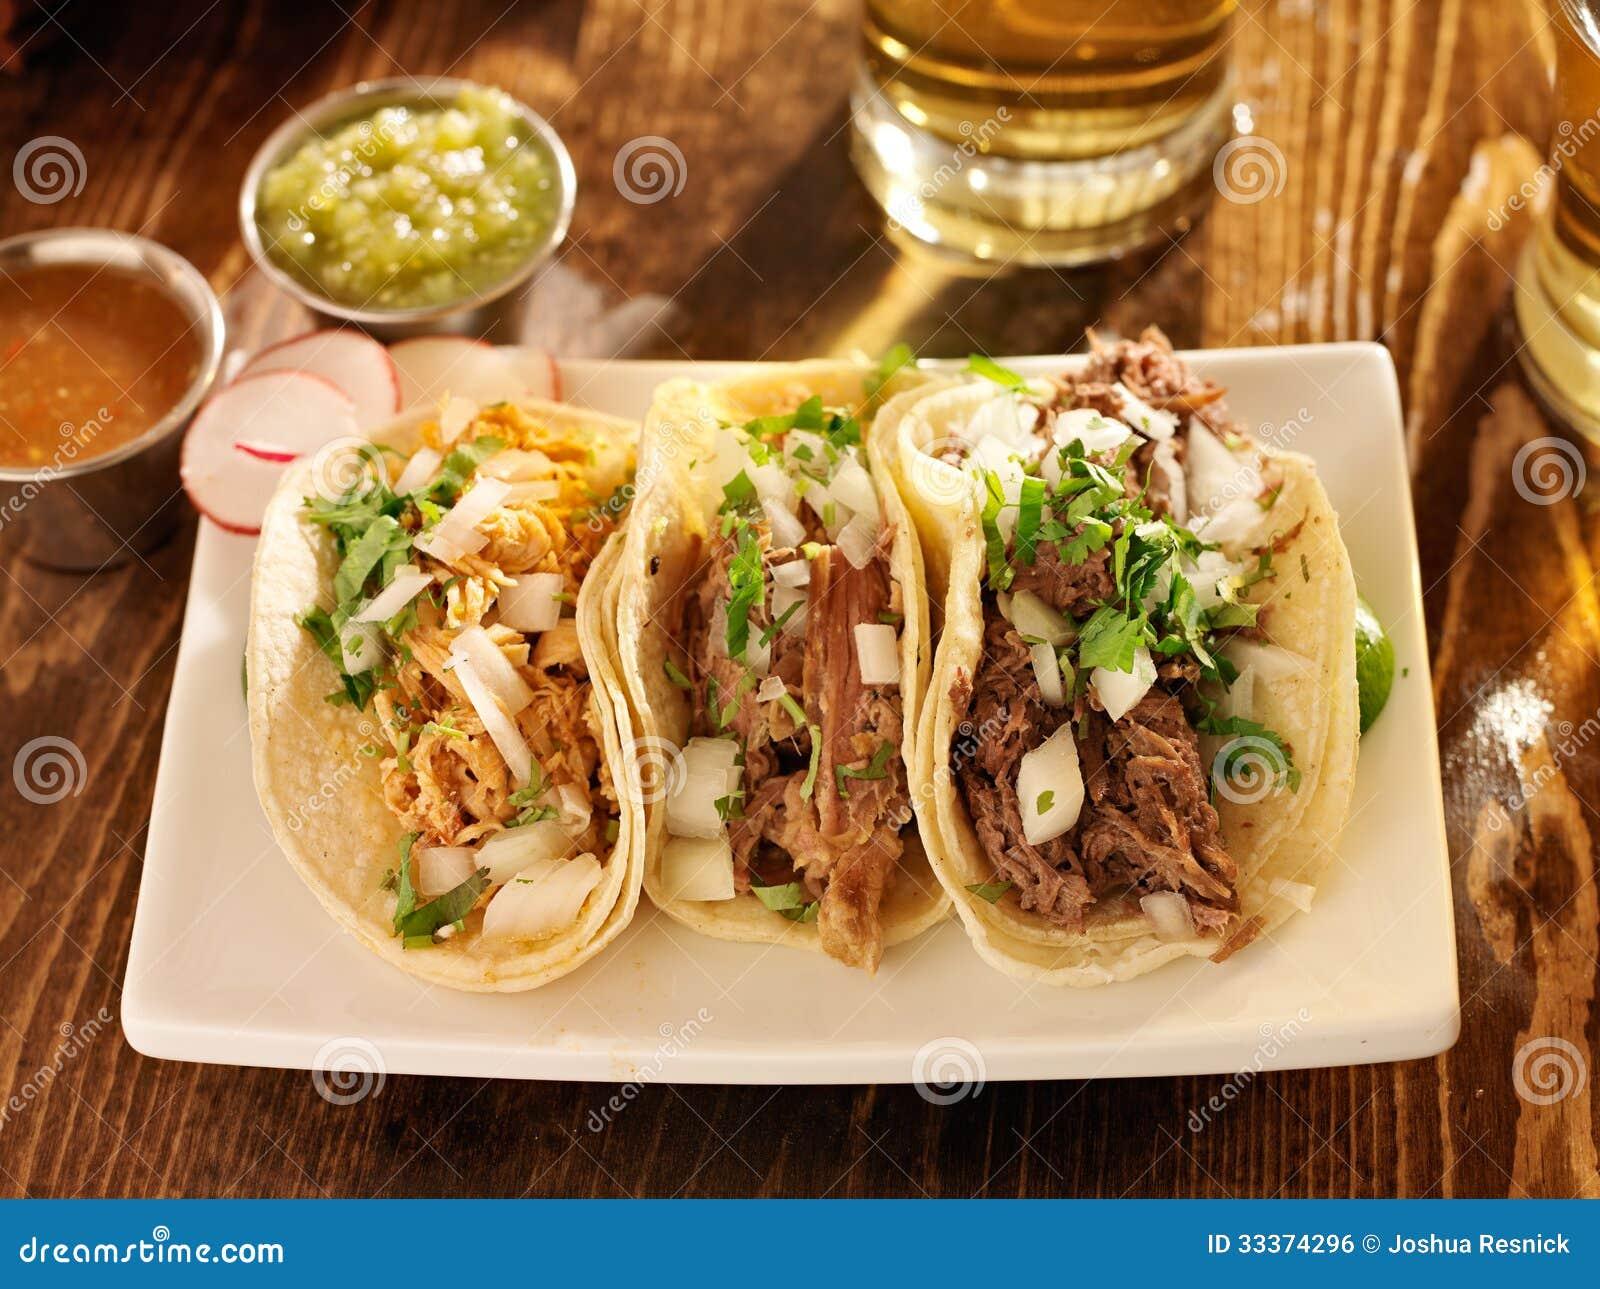 Tacos made in authentic mexican style stock photo image - Tacos mexicanos de pollo ...